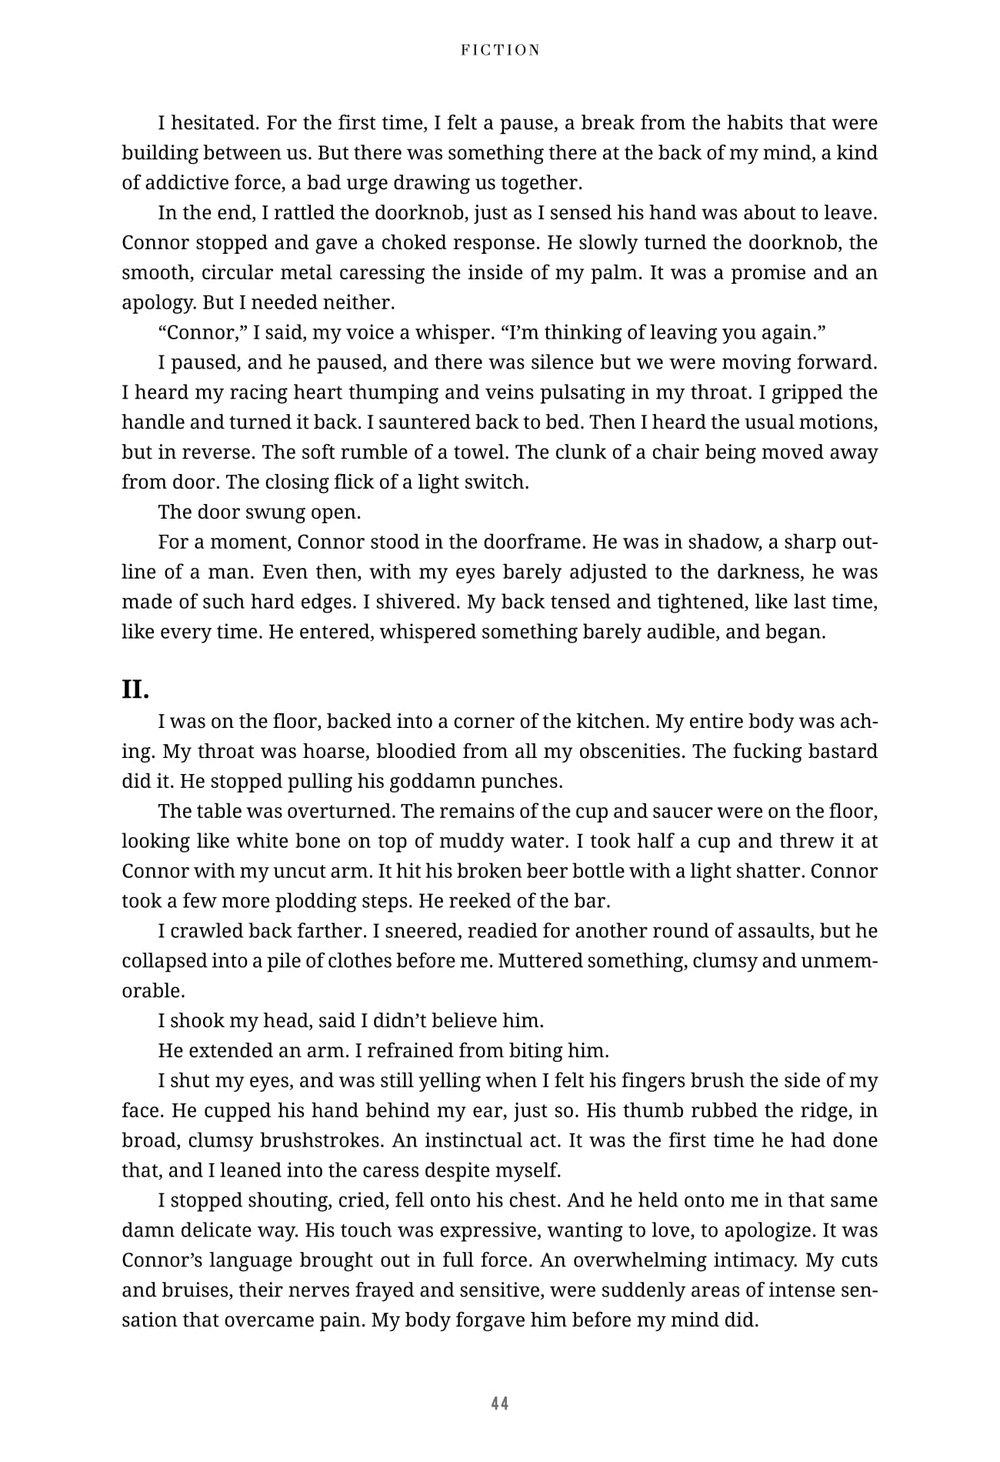 Final_PDF.45-1.jpg